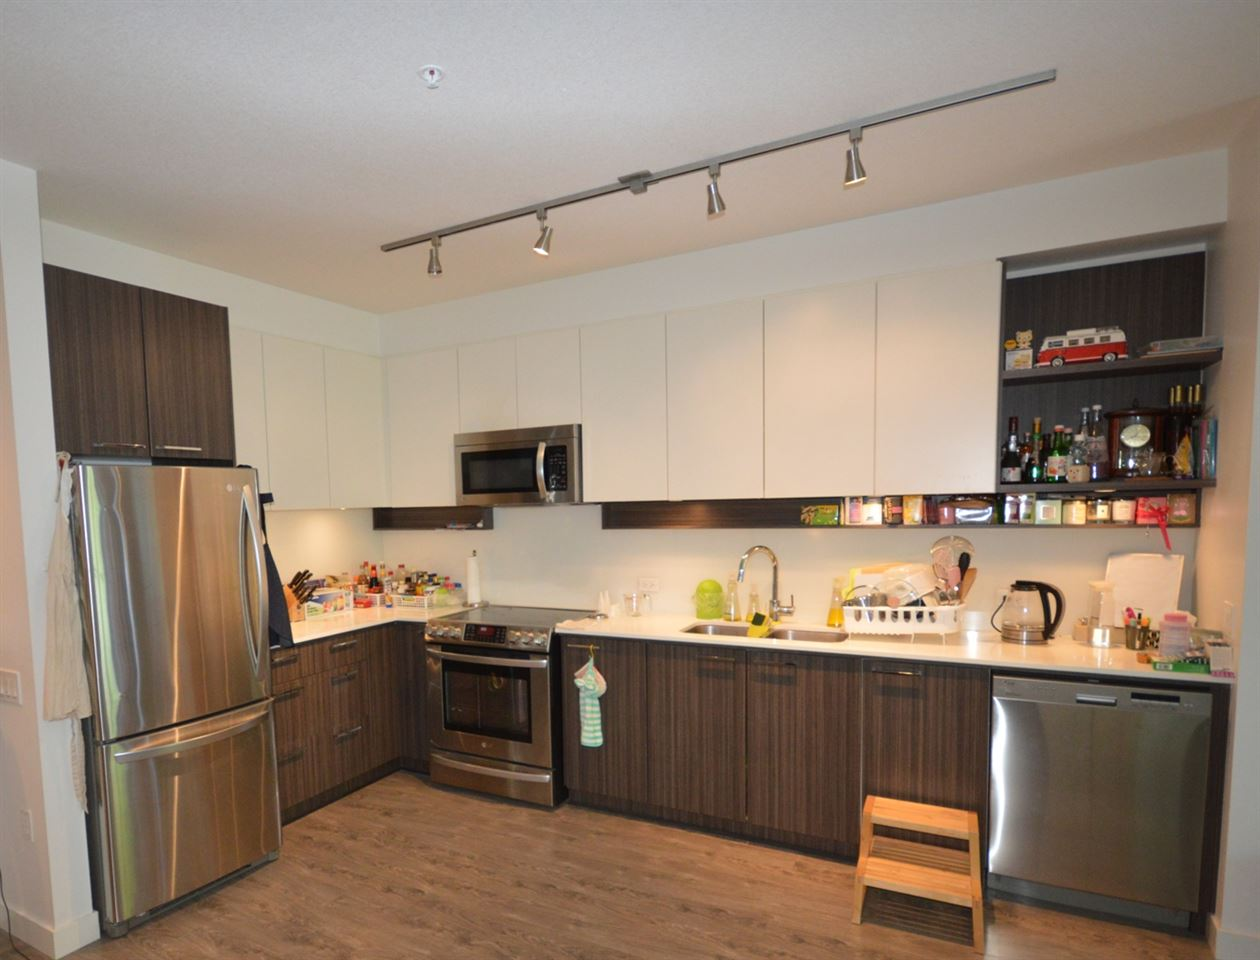 Condo Apartment at 203 9250 UNIVERSITY HIGH STREET, Unit 203, Burnaby North, British Columbia. Image 2